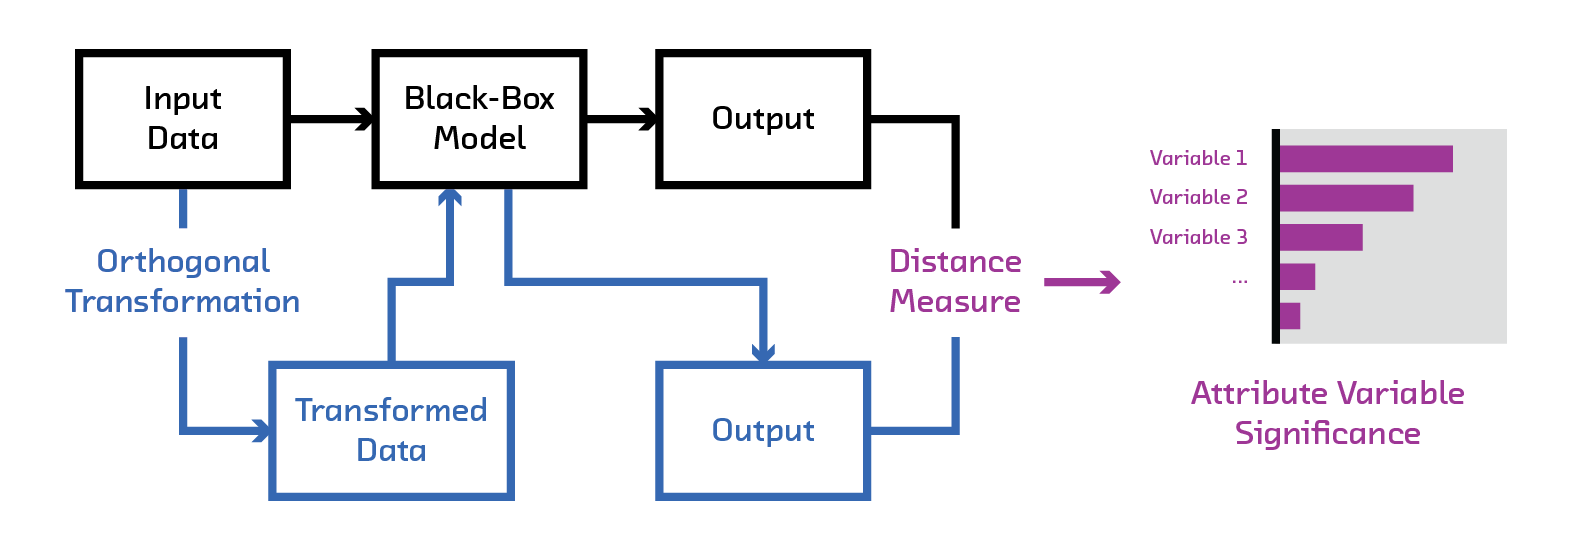 fairml auditing black box predictive models rh blog fastforwardlabs com block box diagram maker block box diagram maker